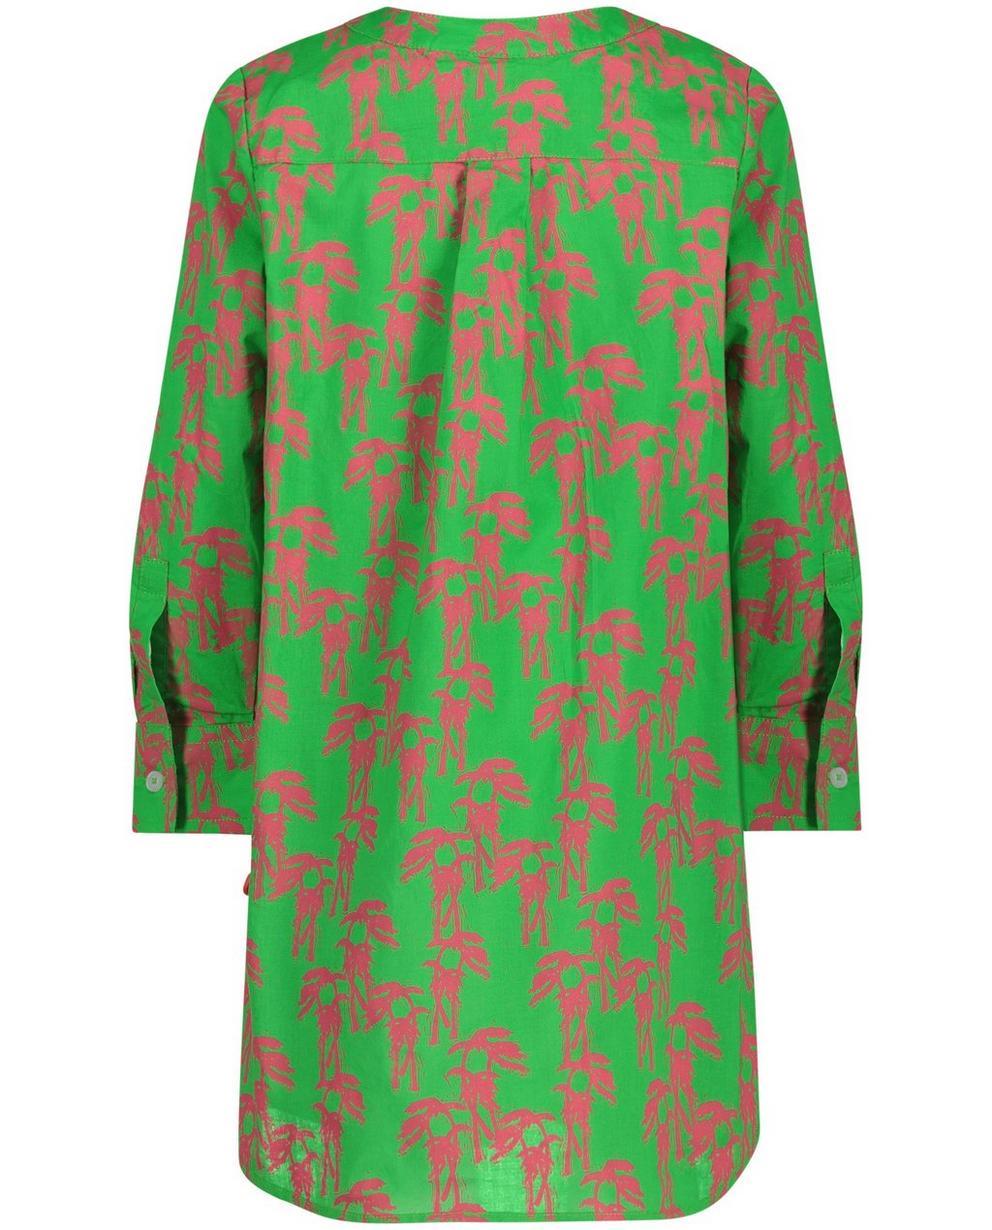 Robes - bright green - Grasgroene hemdjurk